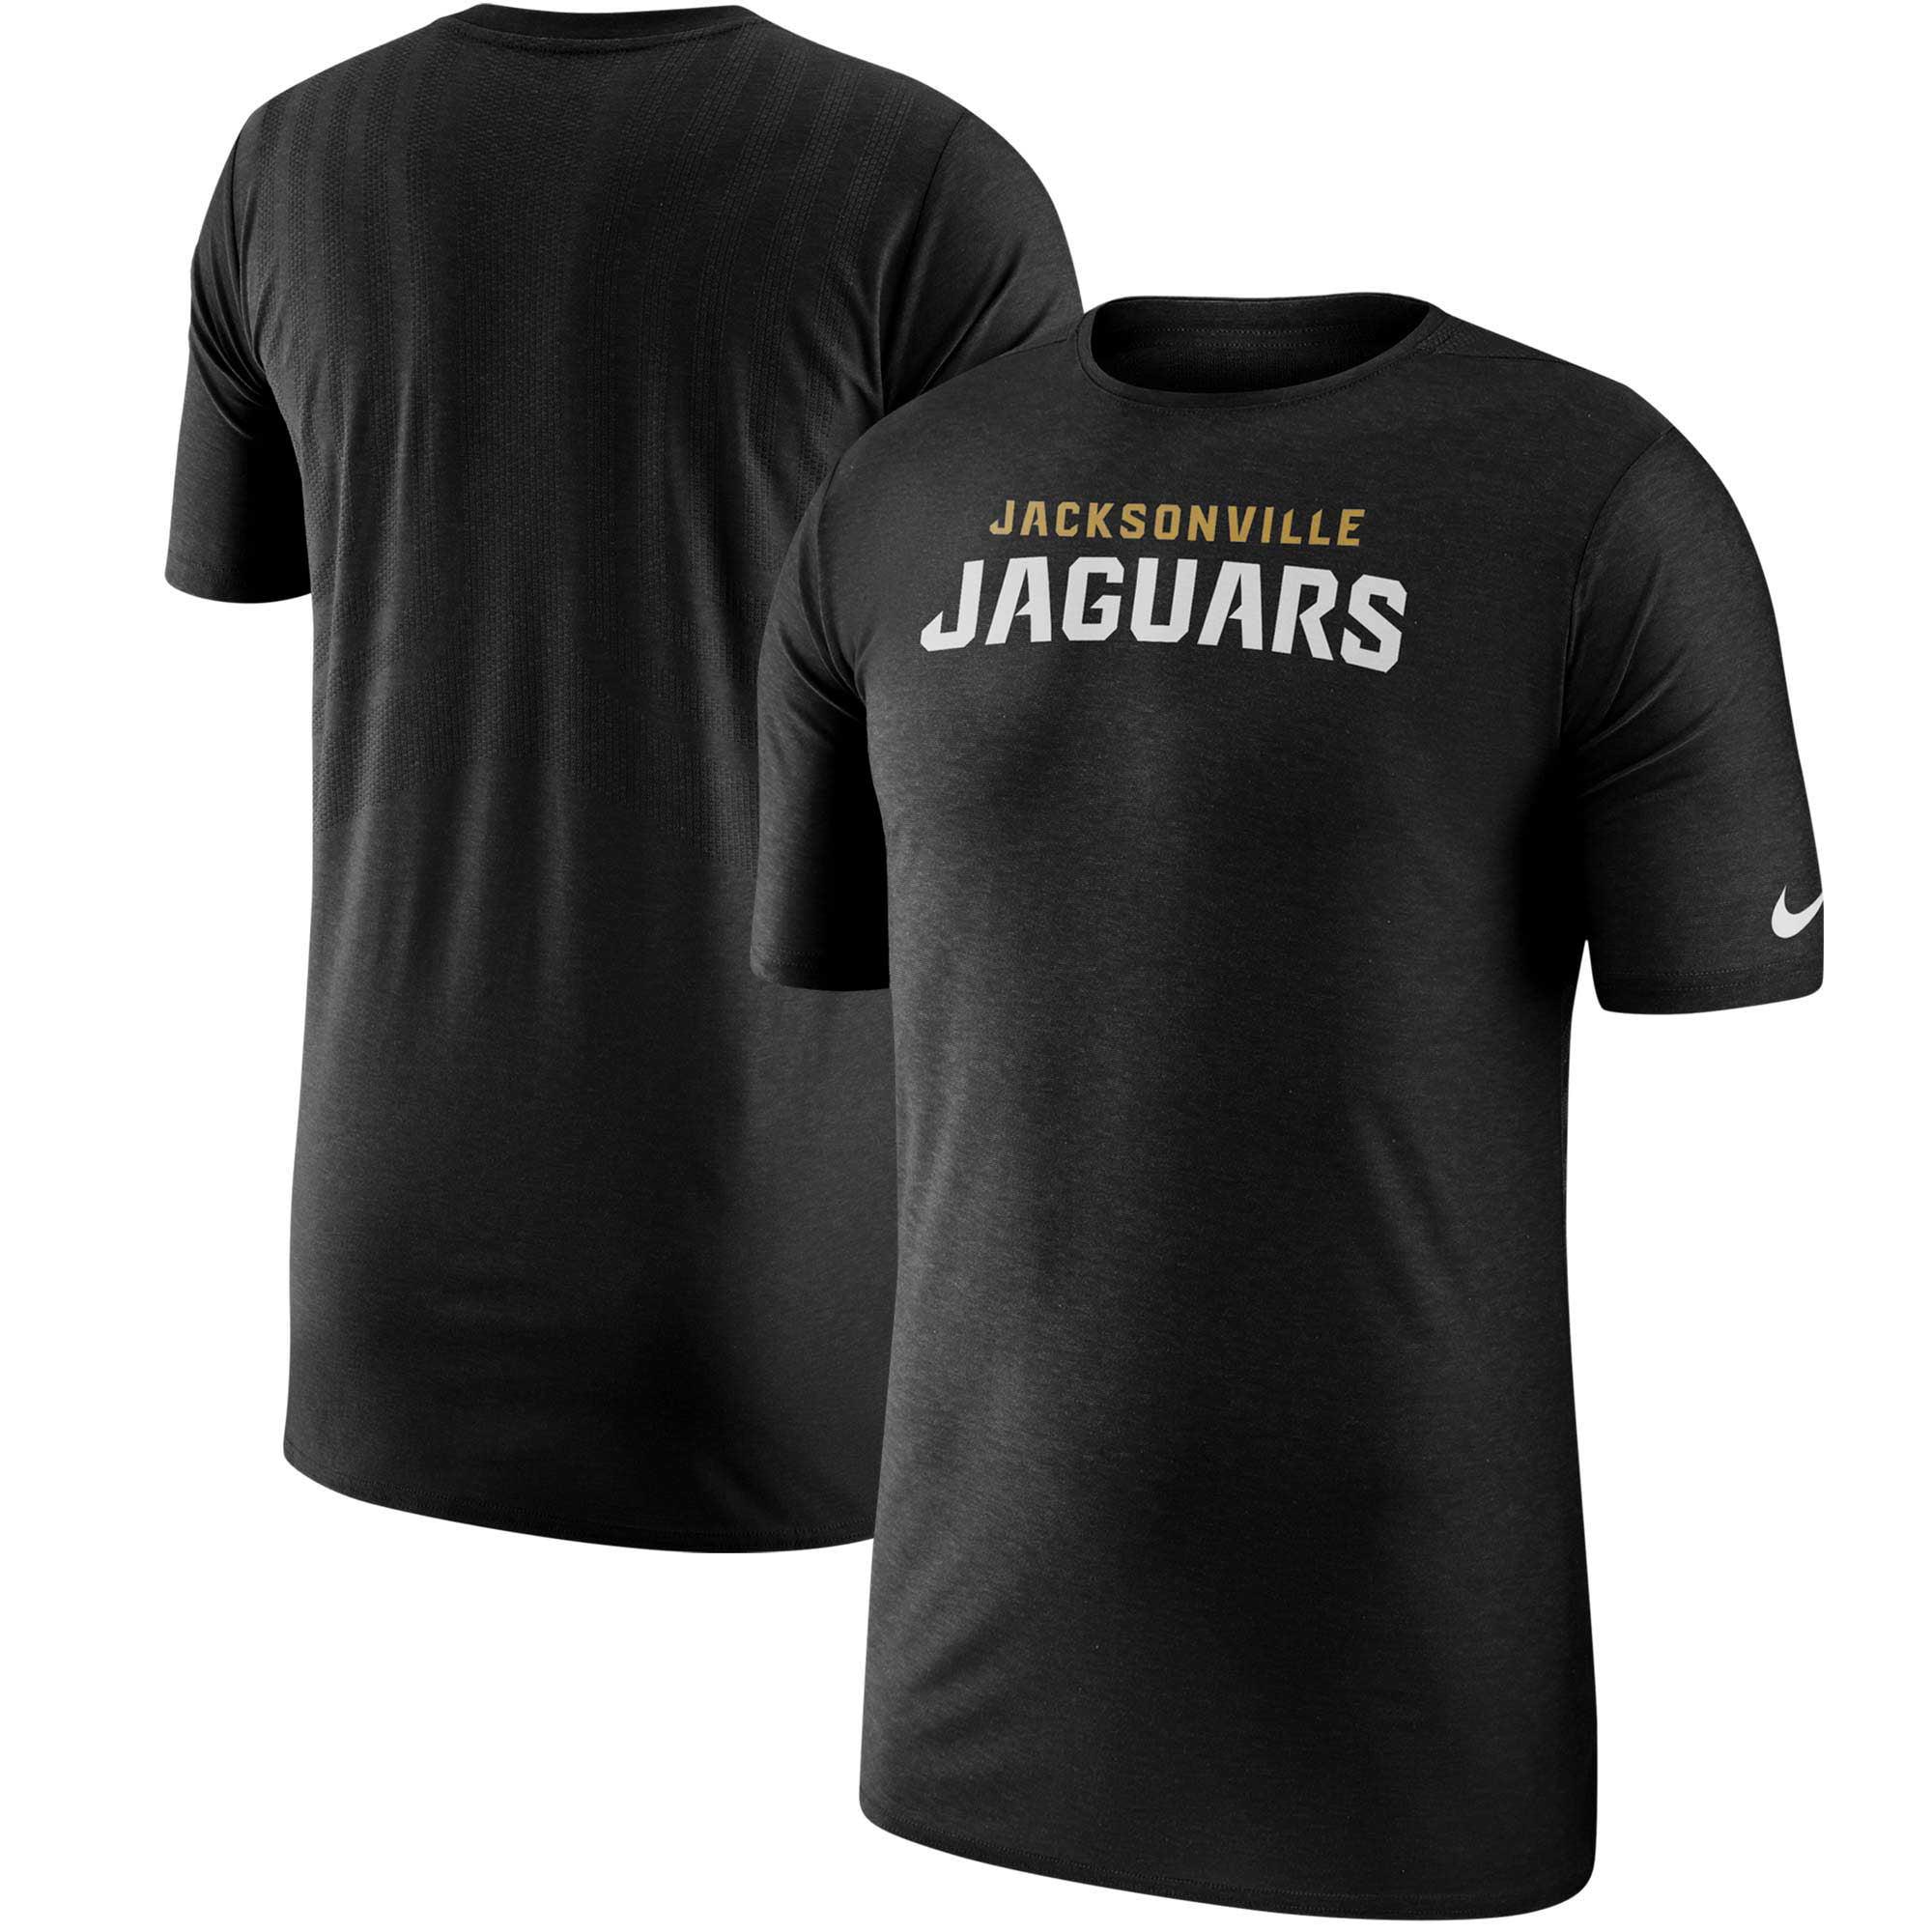 Jacksonville Jaguars Nike Sideline Player T-Shirt - Black